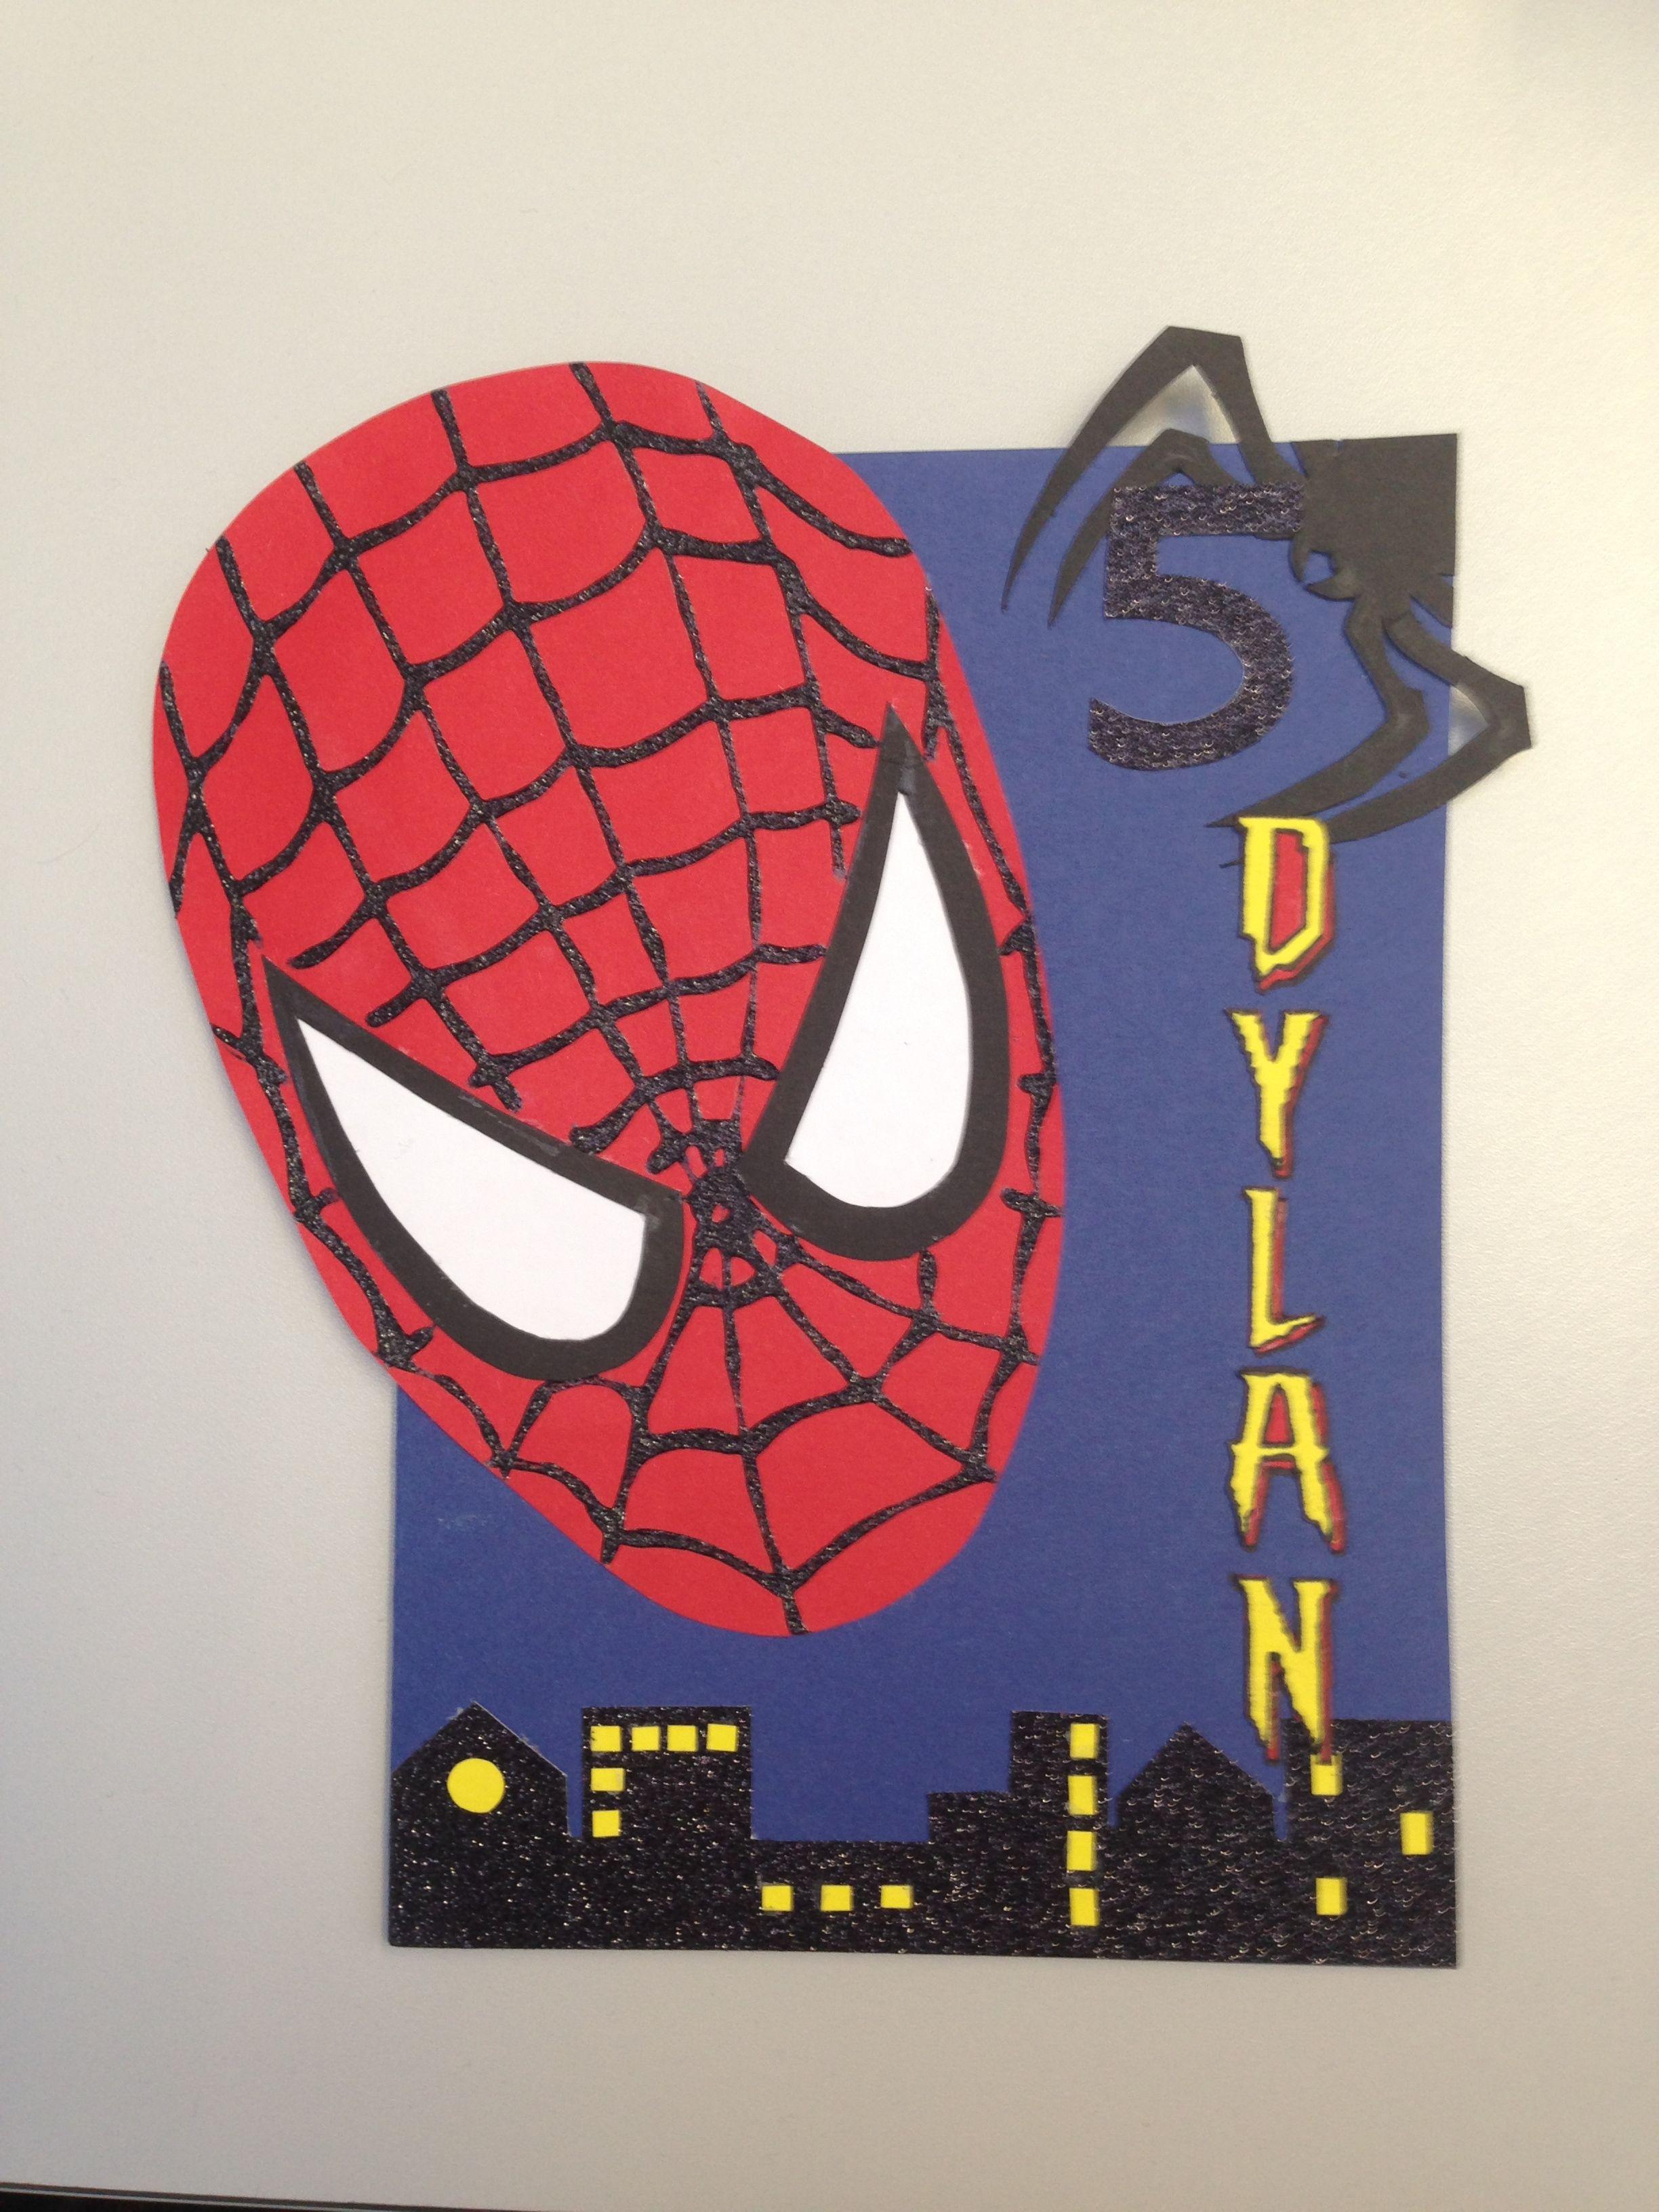 Spiderman Birthday Card : spiderman, birthday, Serena, Joseph, Children's, Birthday, Cards, Special, Cards,, Spiderman, Cricut